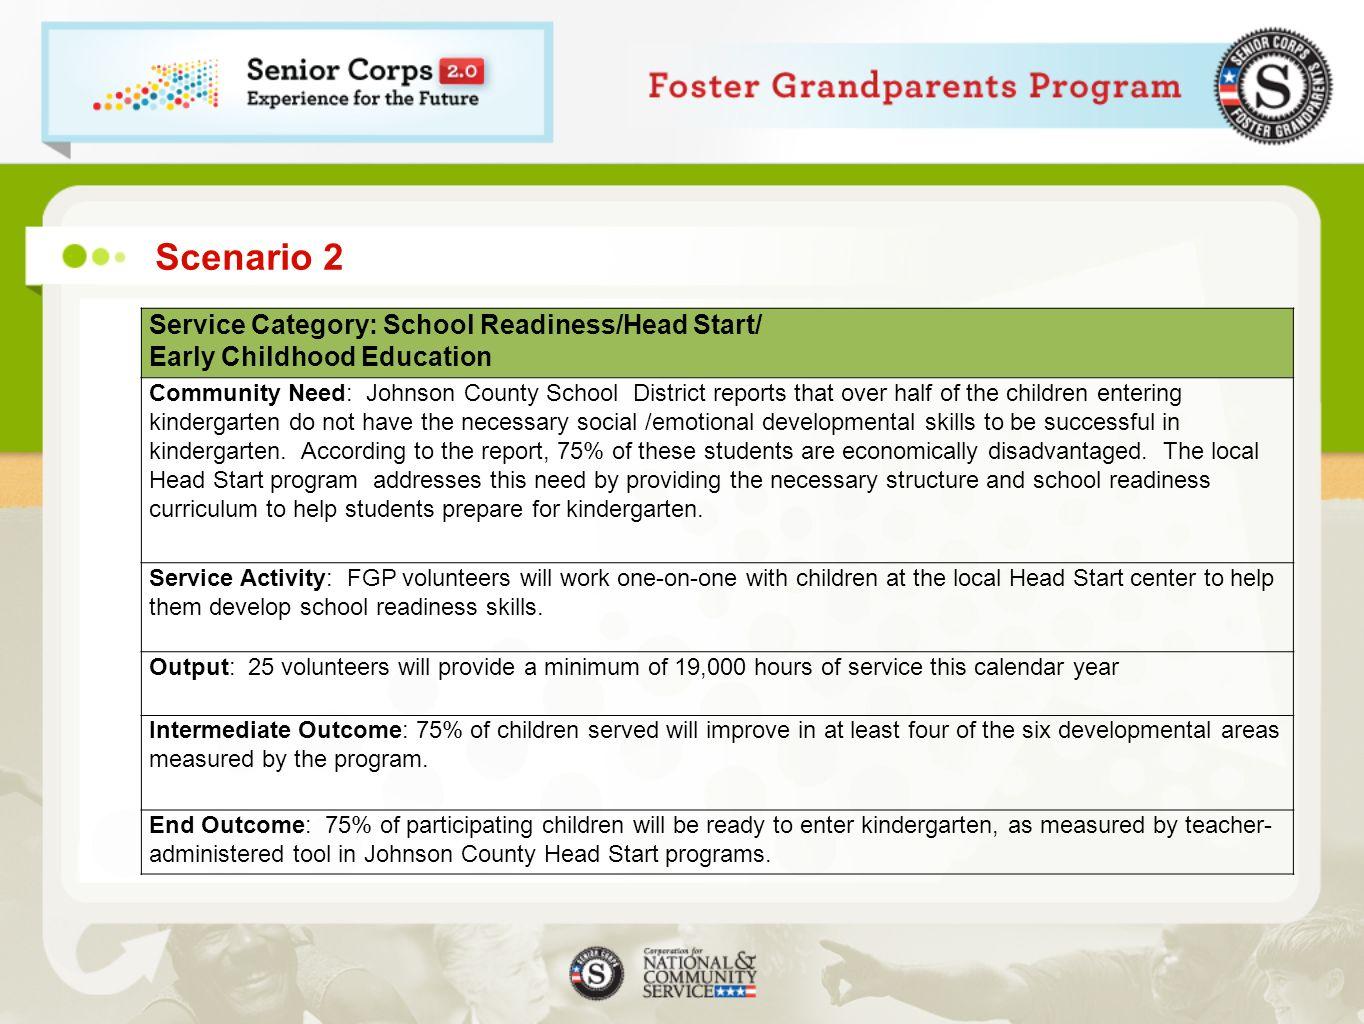 Scenario 2 Service Category: School Readiness/Head Start/